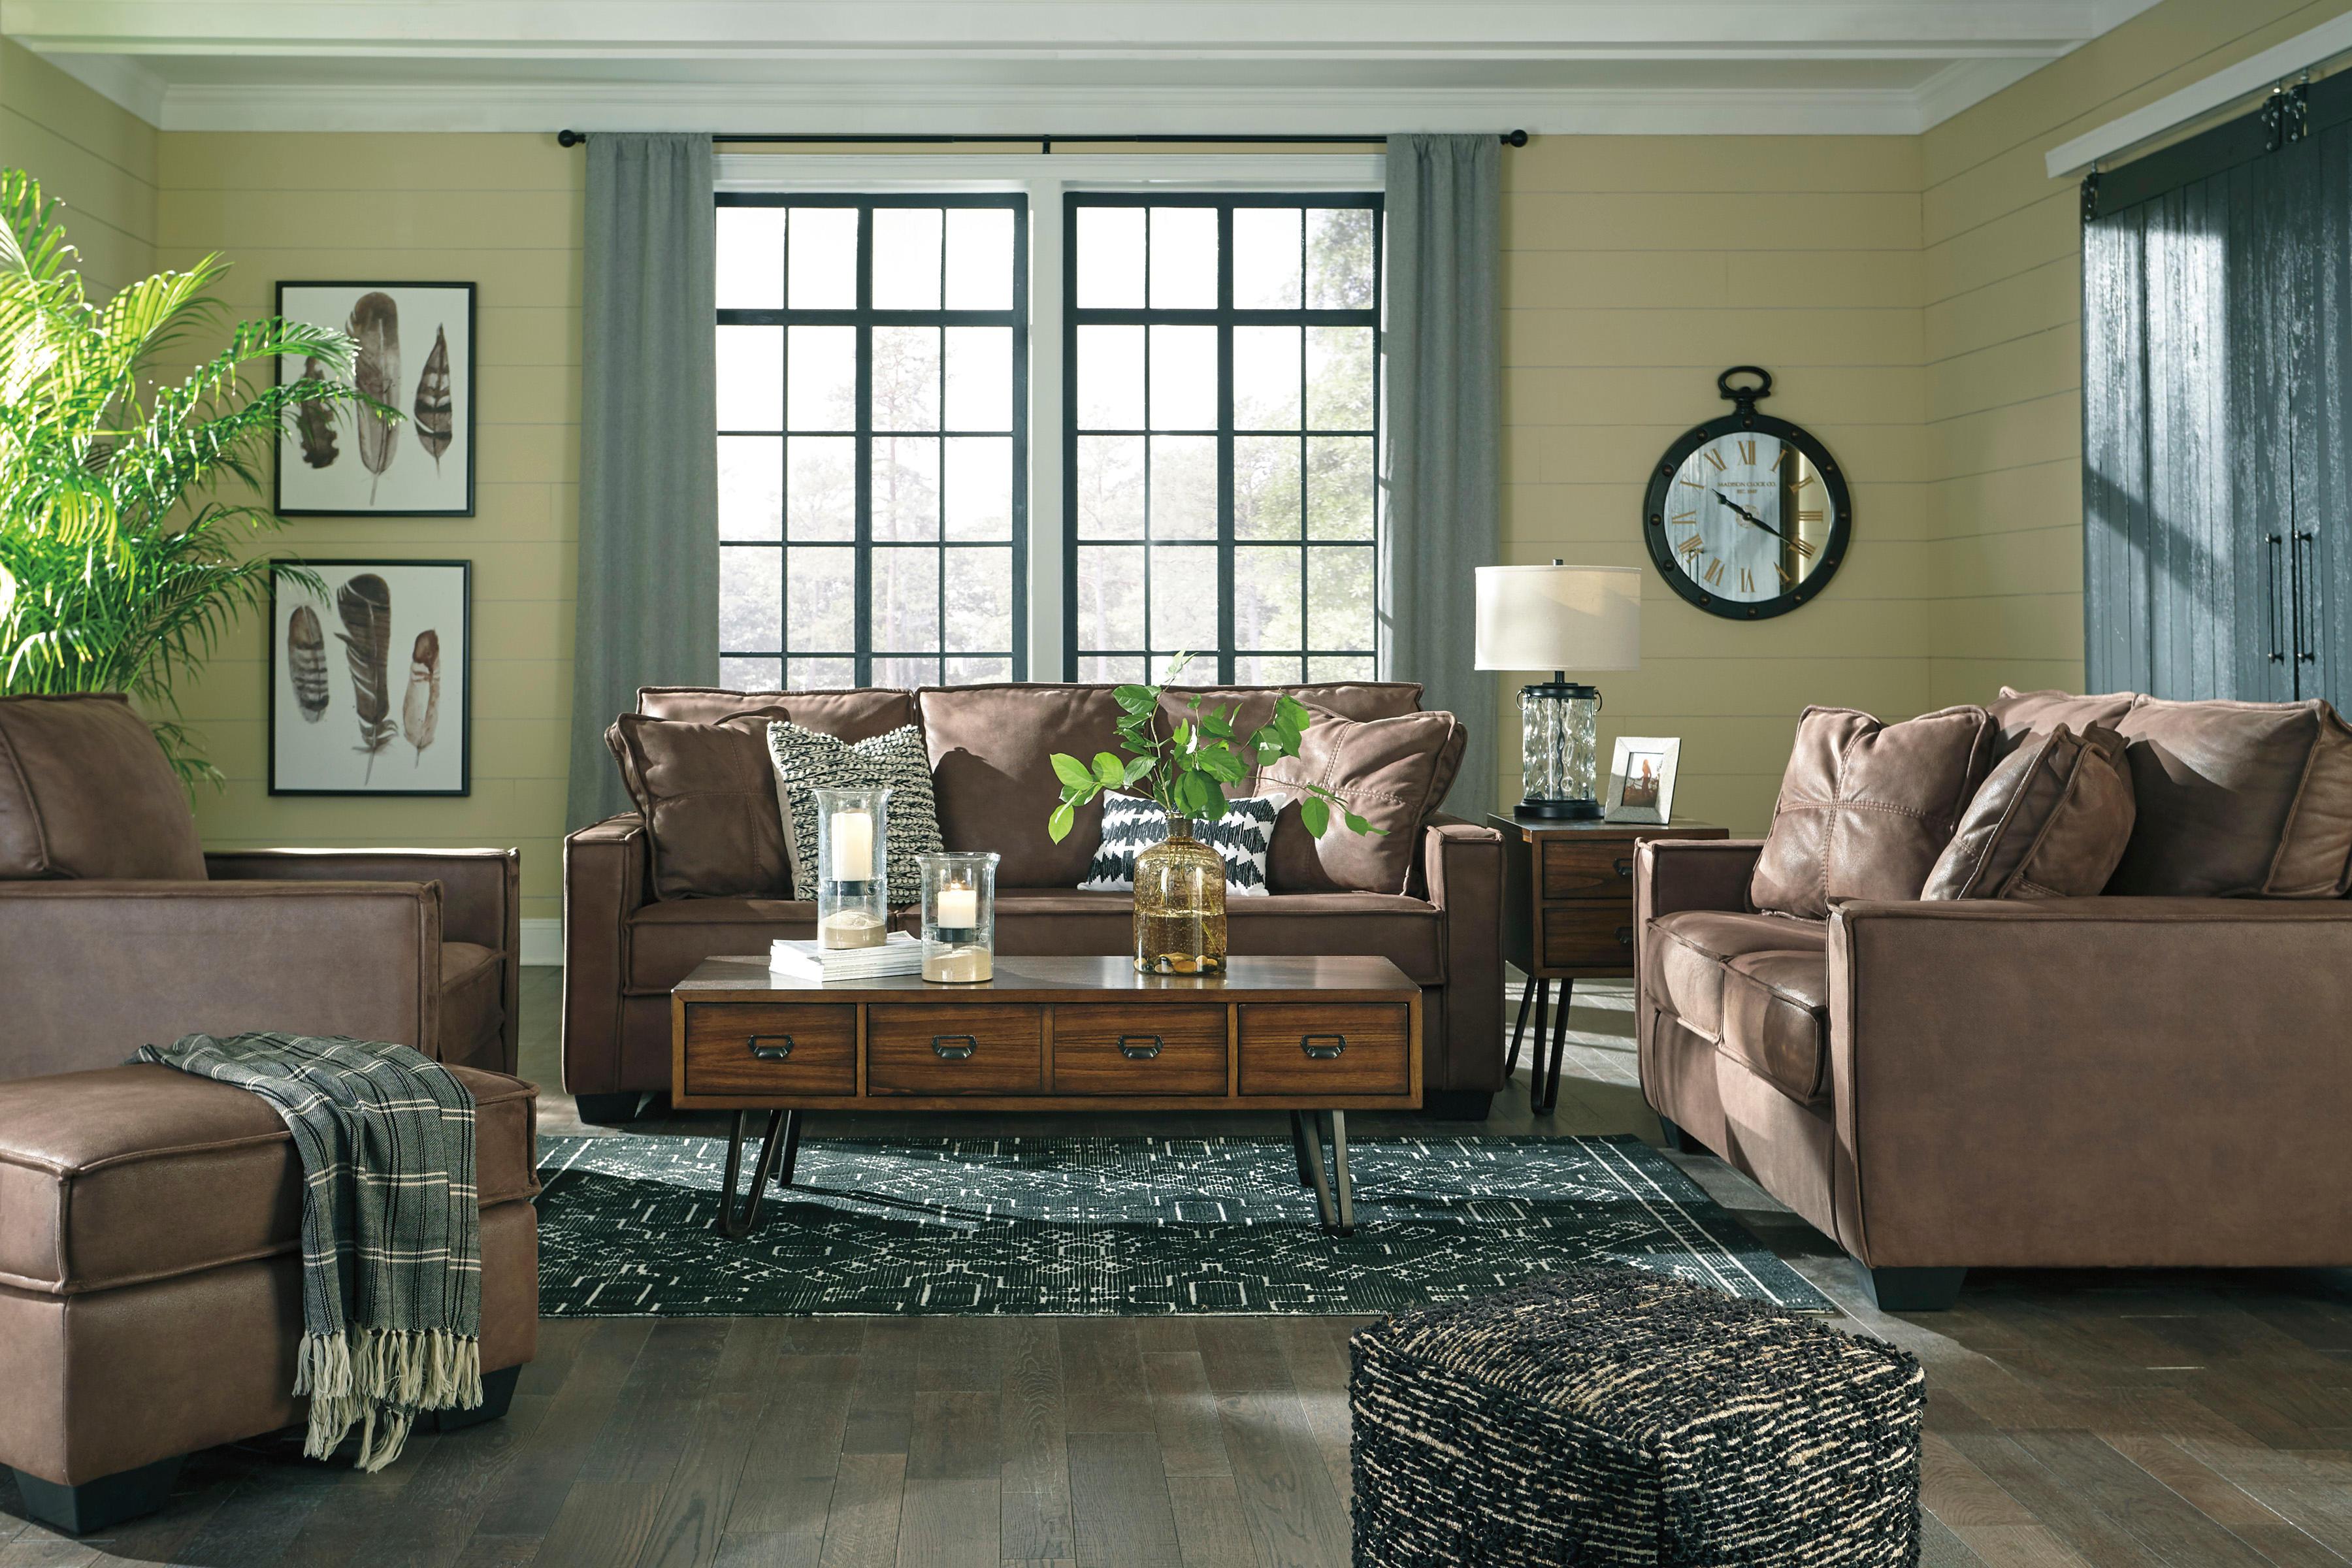 Wg R Furniture 800 Hansen Rd Green Bay Wi 54304 Yp Com